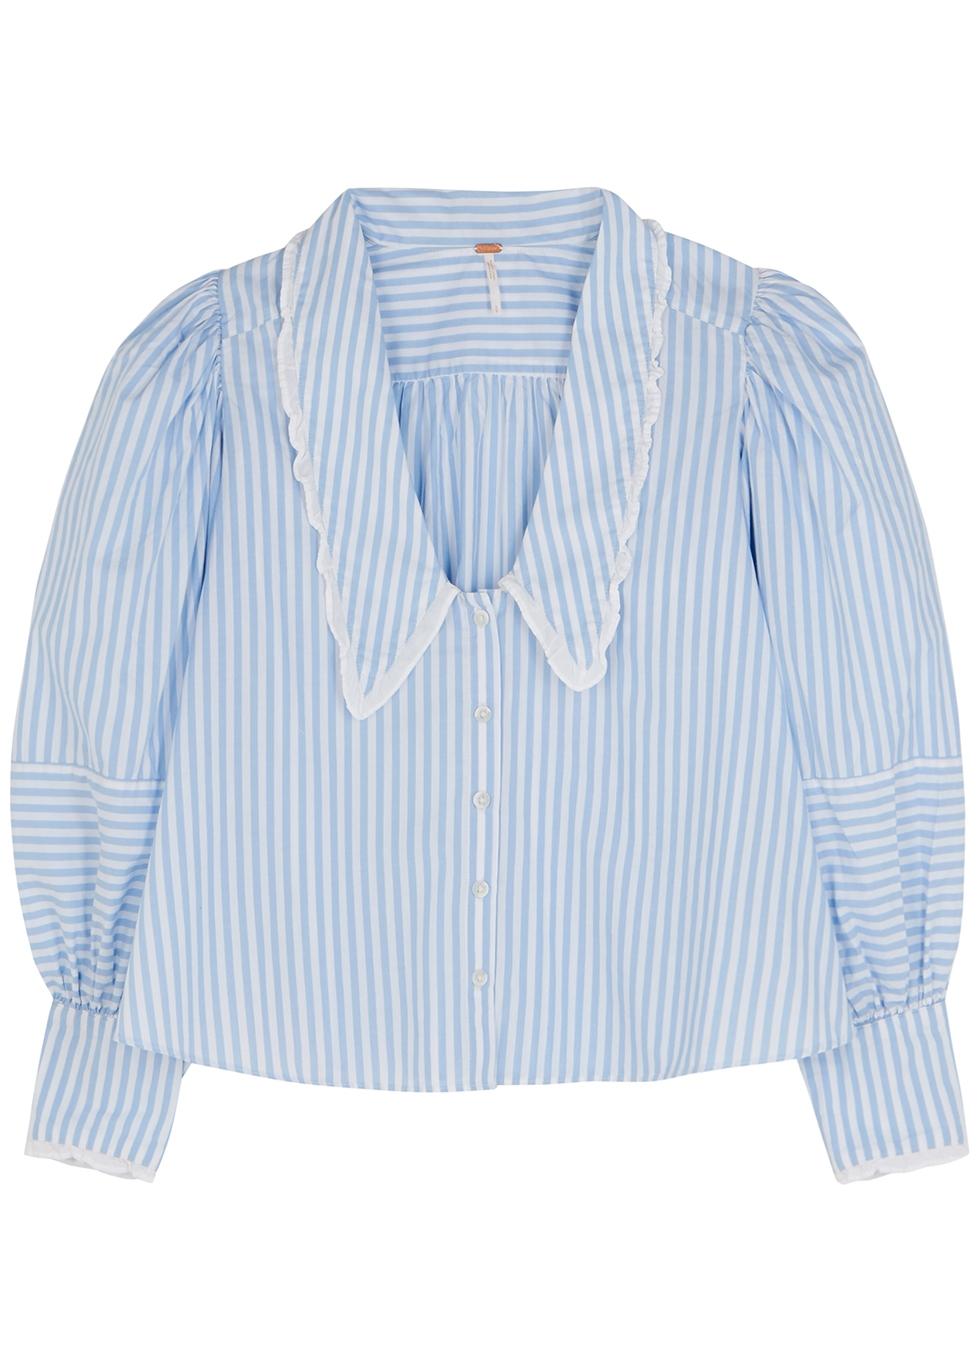 Bexley blue striped cotton shirt